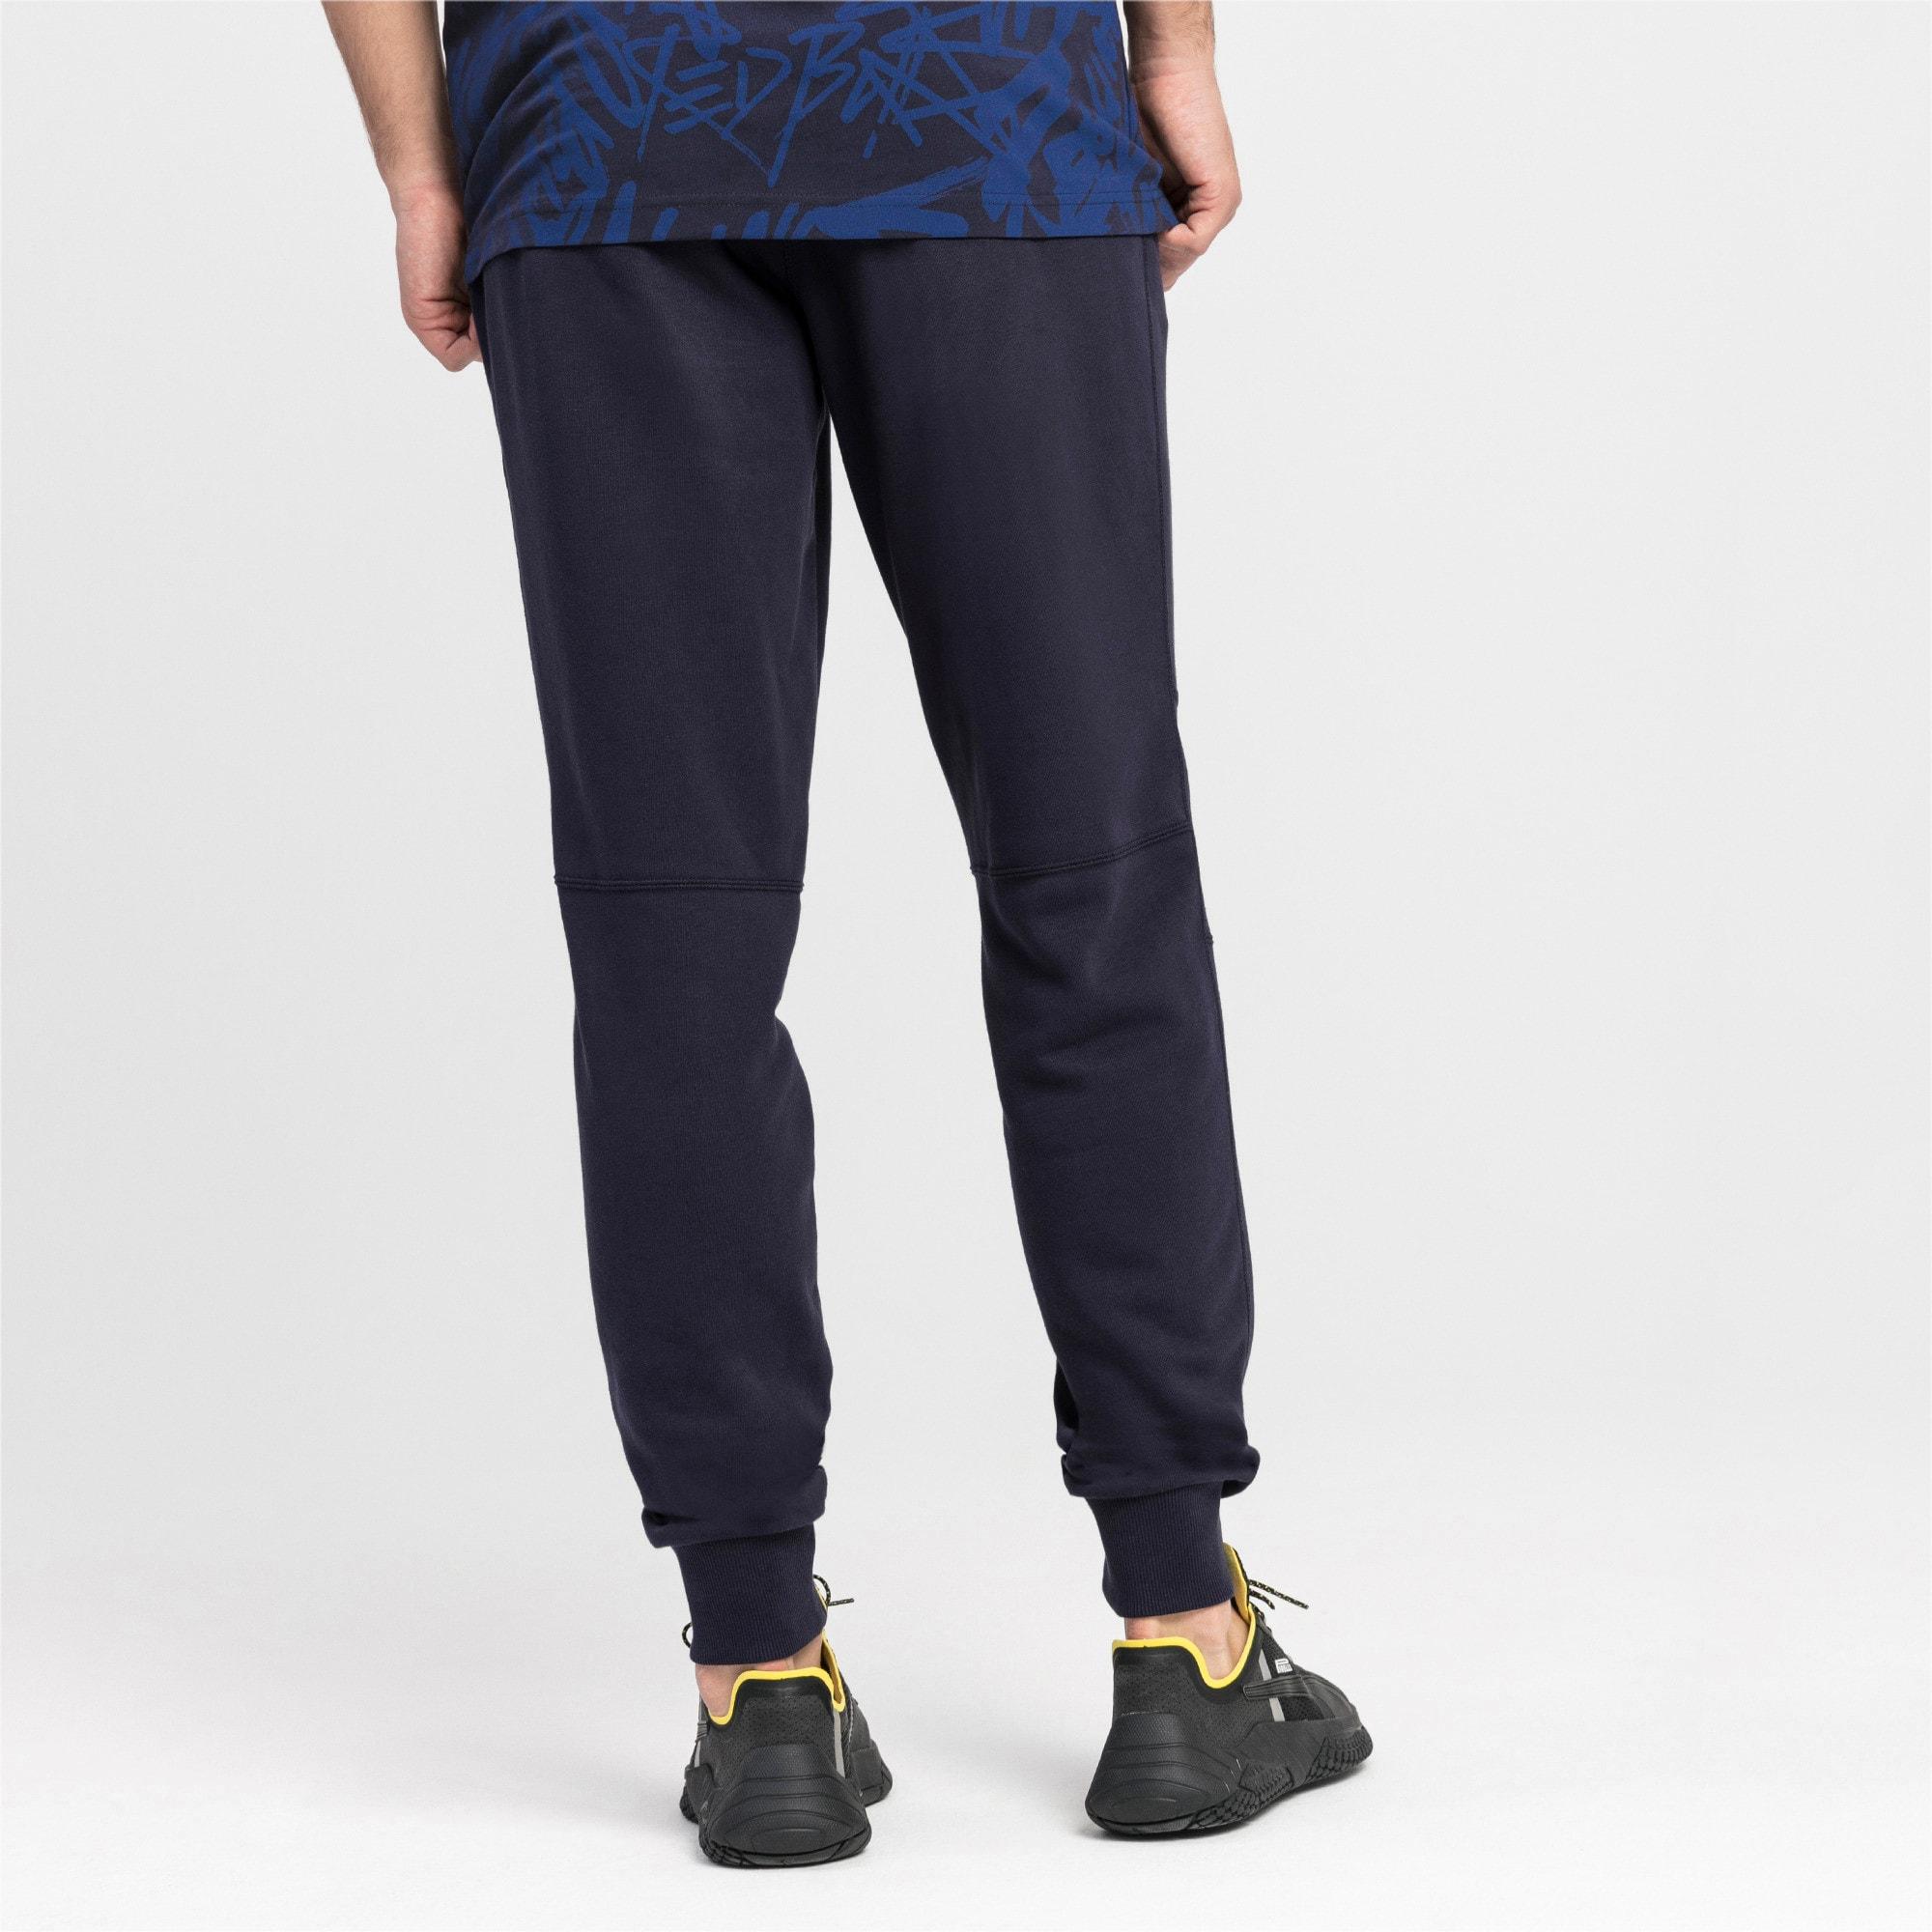 Thumbnail 2 of Red Bull Racing Knitted Men's Sweat Pants, NIGHT SKY, medium